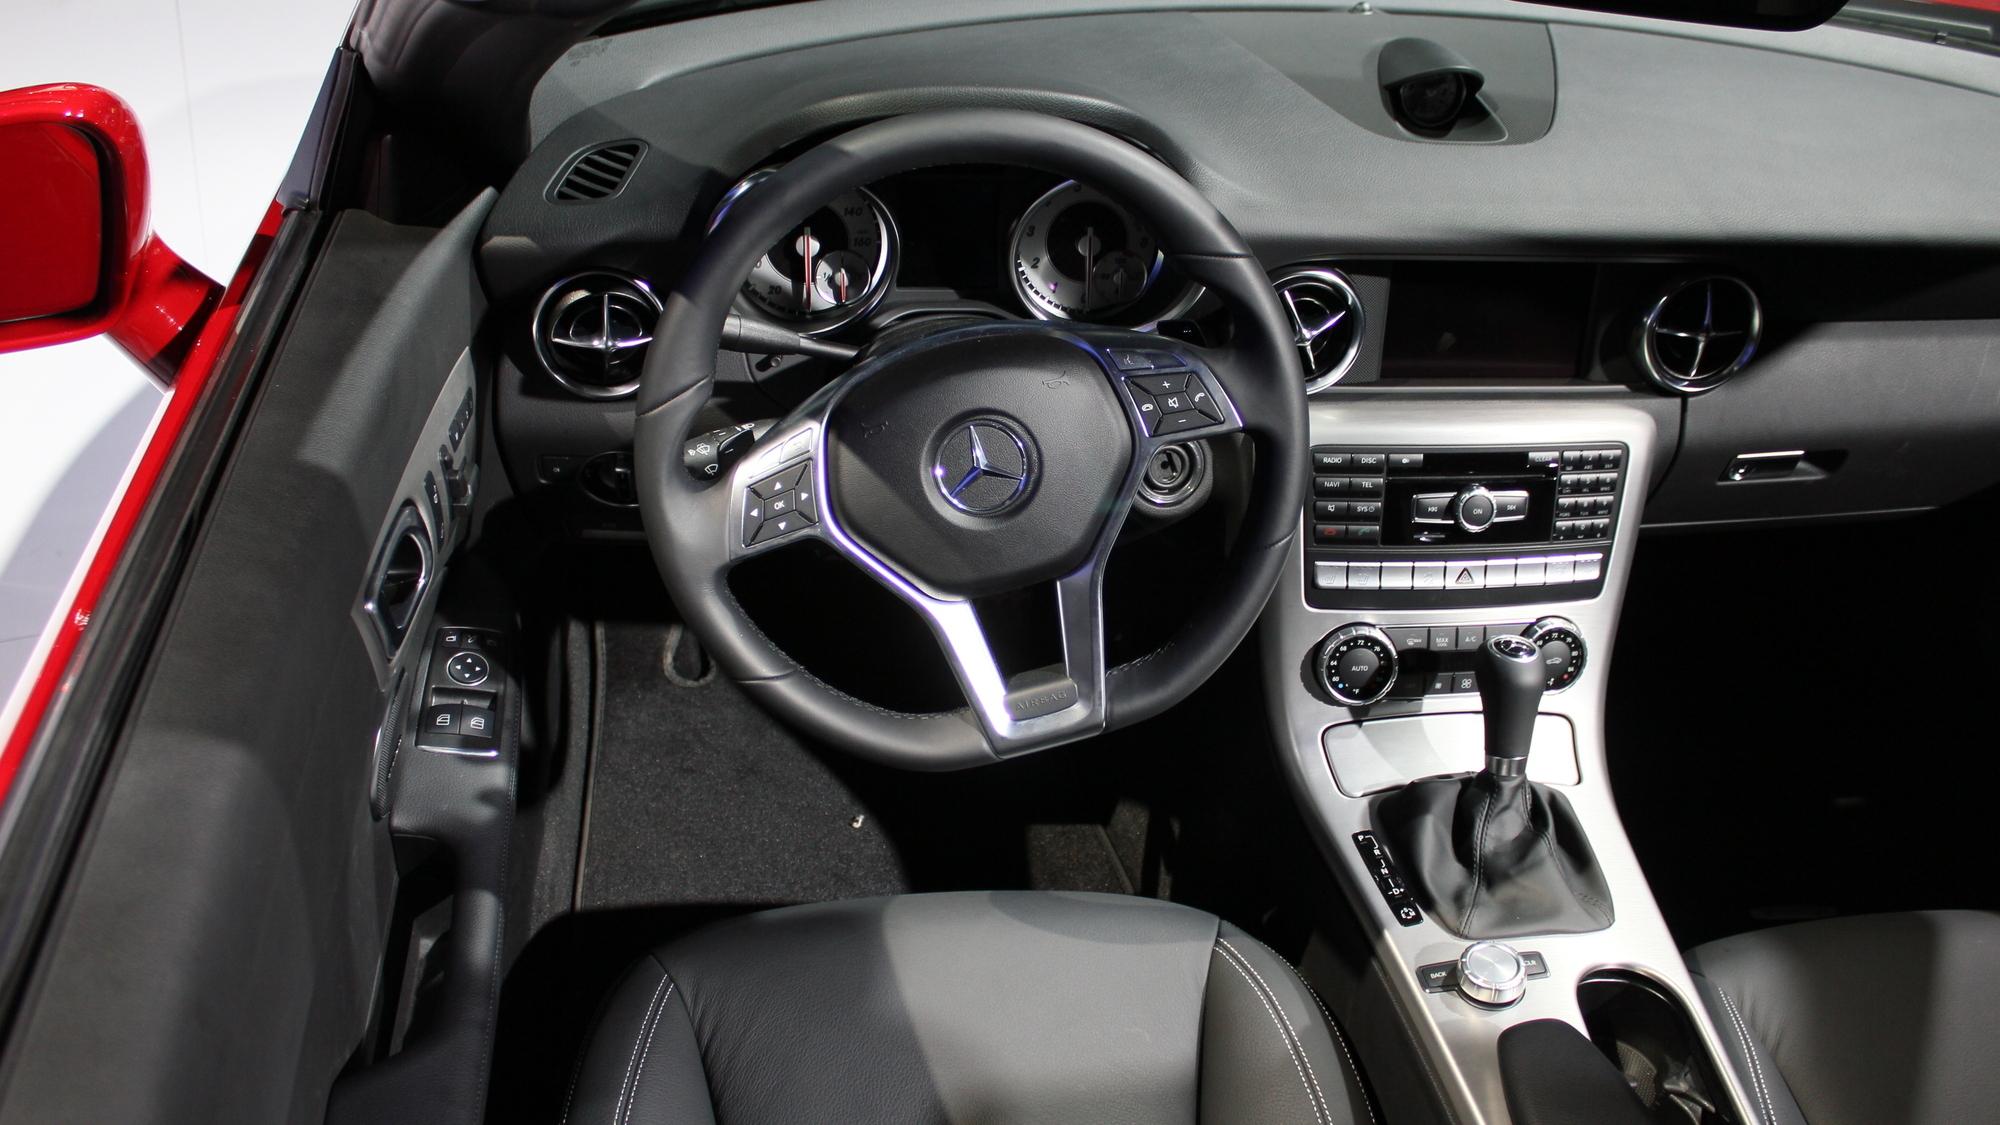 2012 Mercedes-Benz SLK 350 live photos